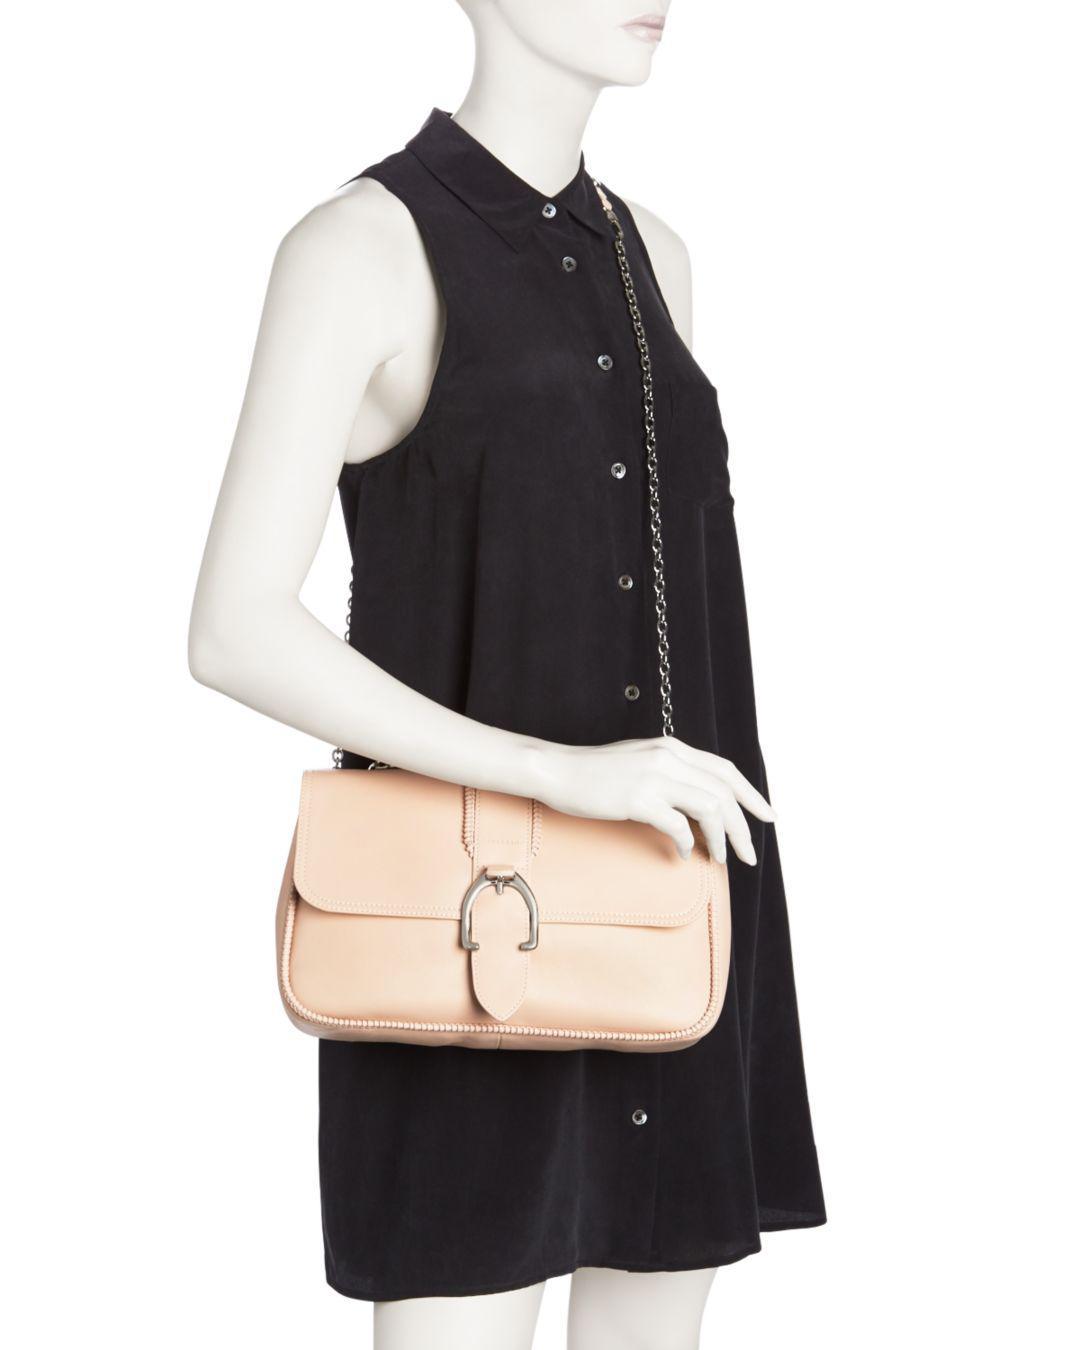 d96bfde8d77d Lyst - Longchamp Medium Leather Shoulder crossbody Bag - in Pink